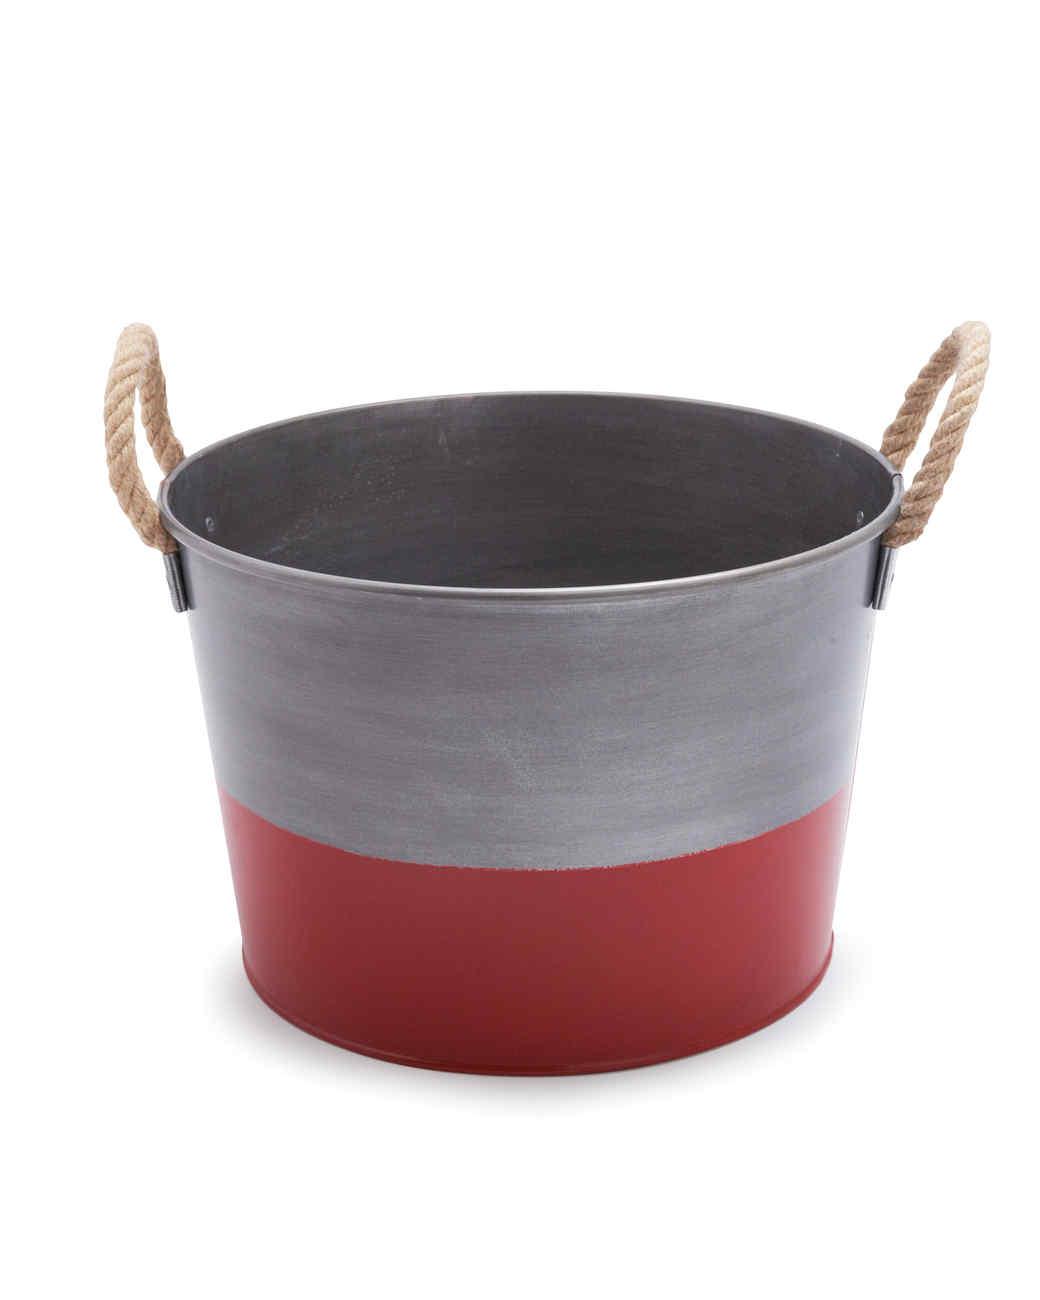 bucket-s111254-1457514-01i-0414-s.jpg